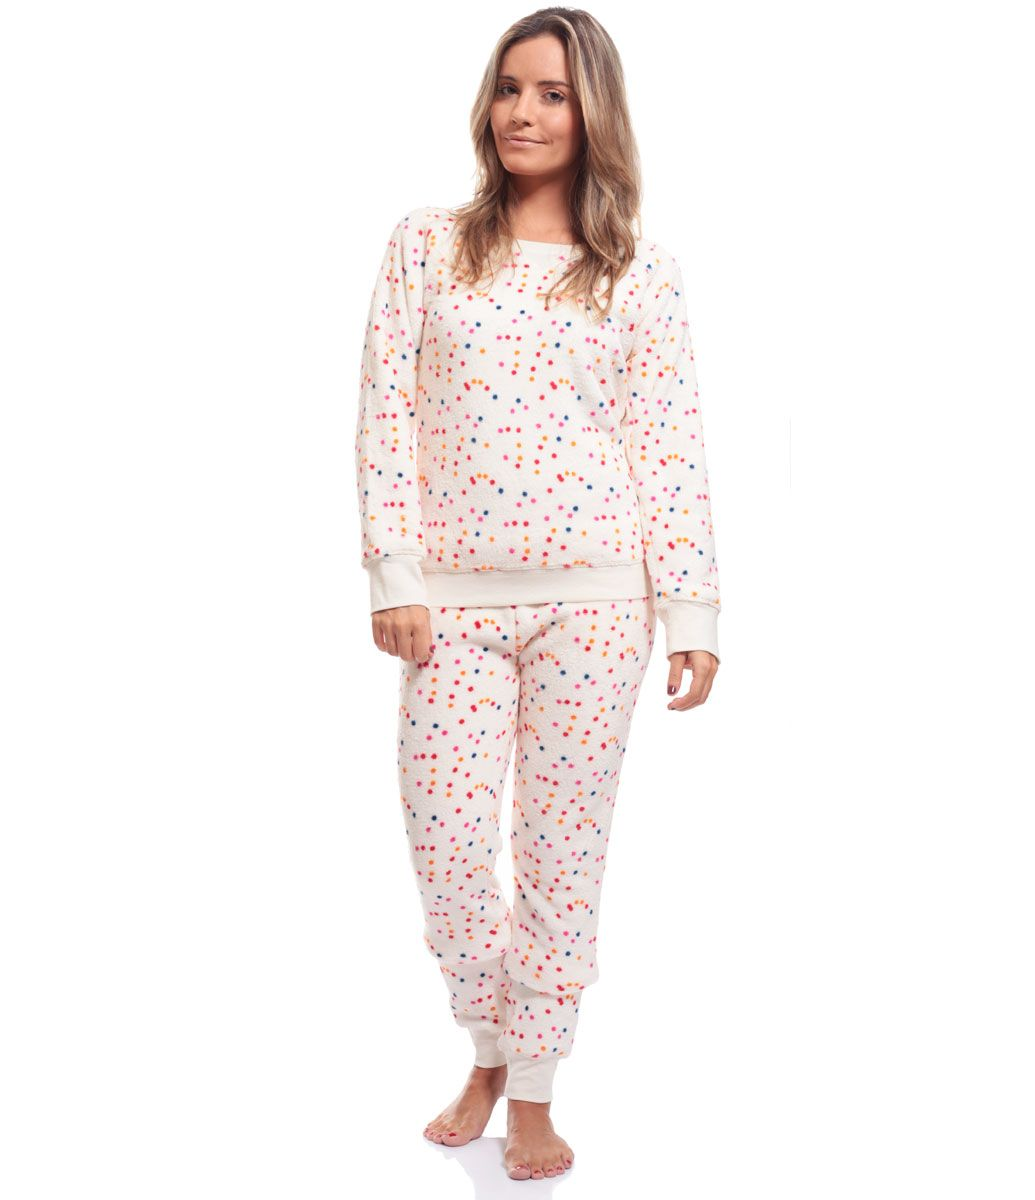 0f9a4e317 Pijama Feminino Longo em Fleece - Lojas Renner | Pijama | Underwear ...